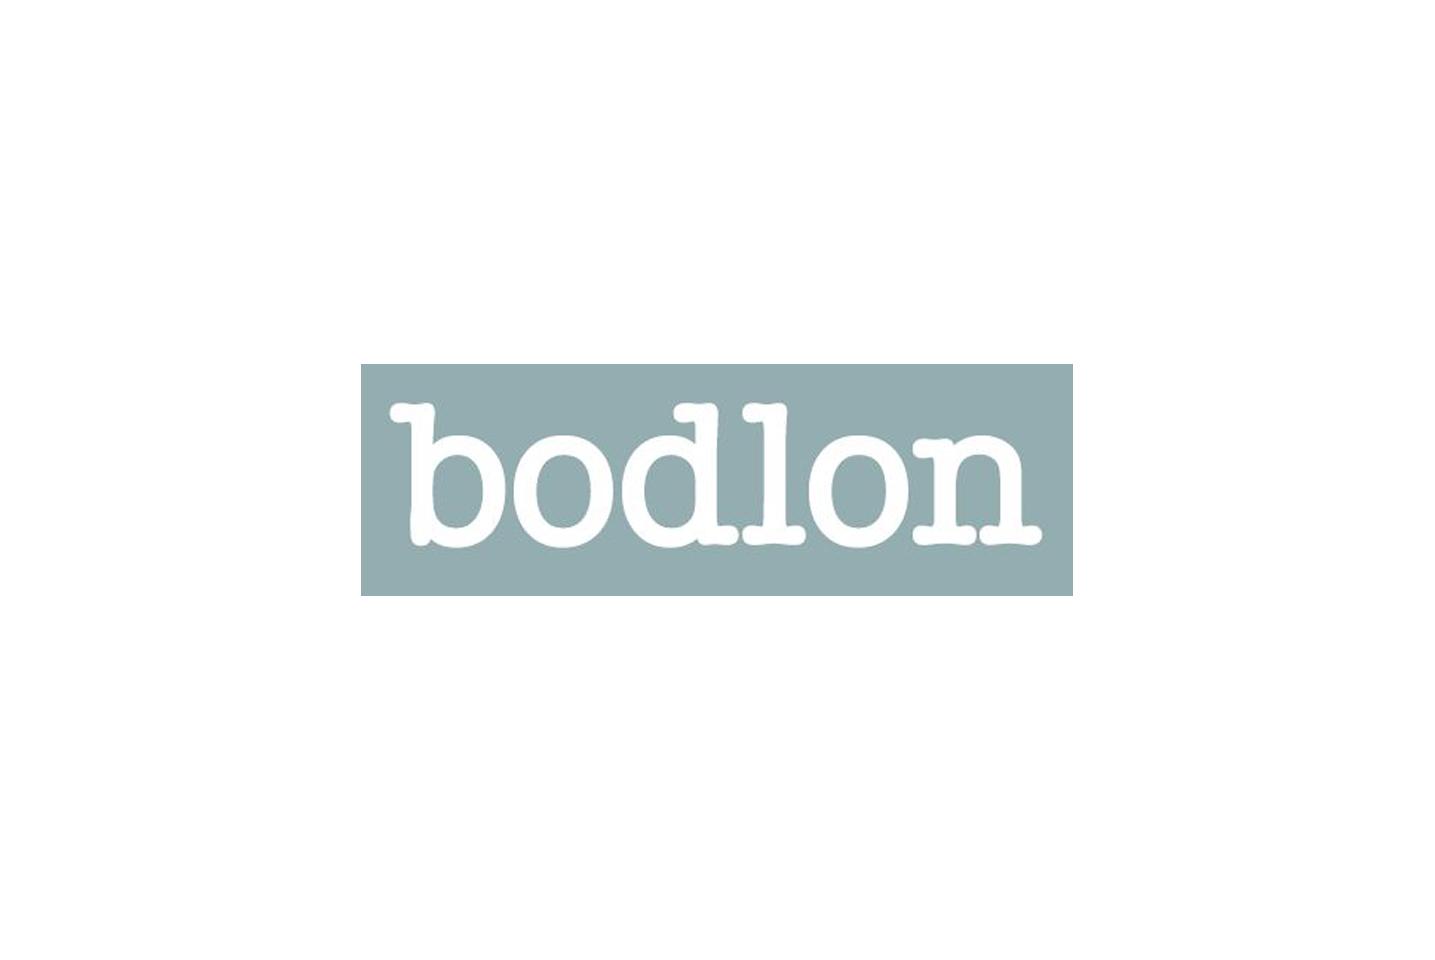 Bodlon.png